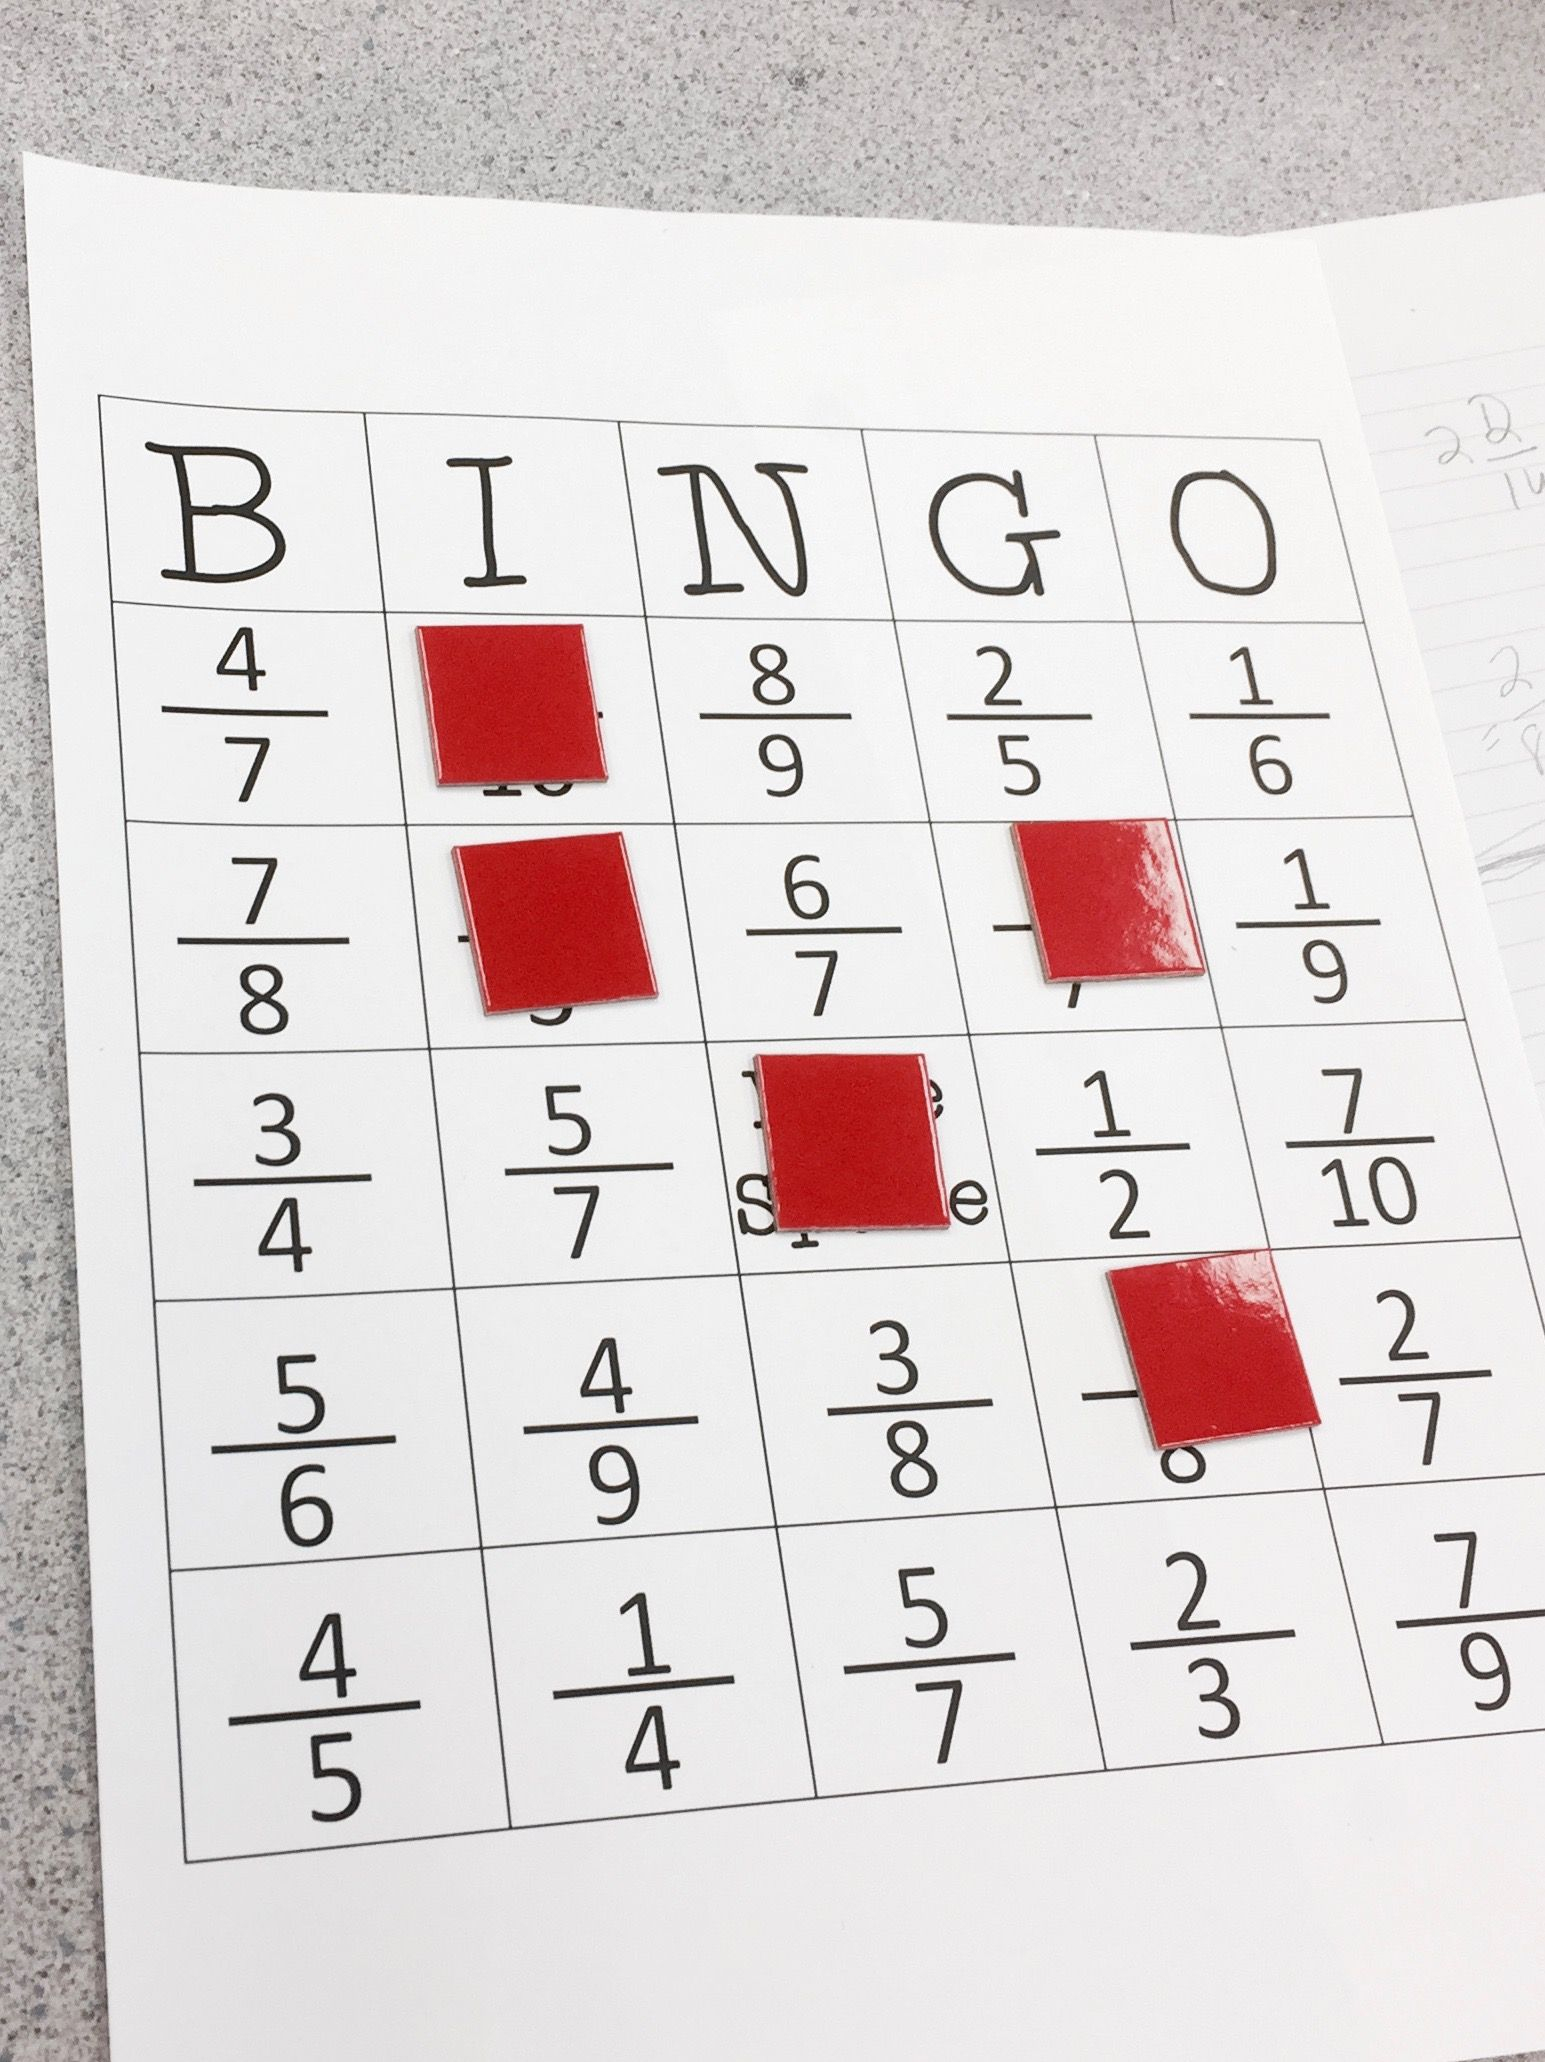 Equivalent Fraction Bingo | Fractions, Math, Fractions